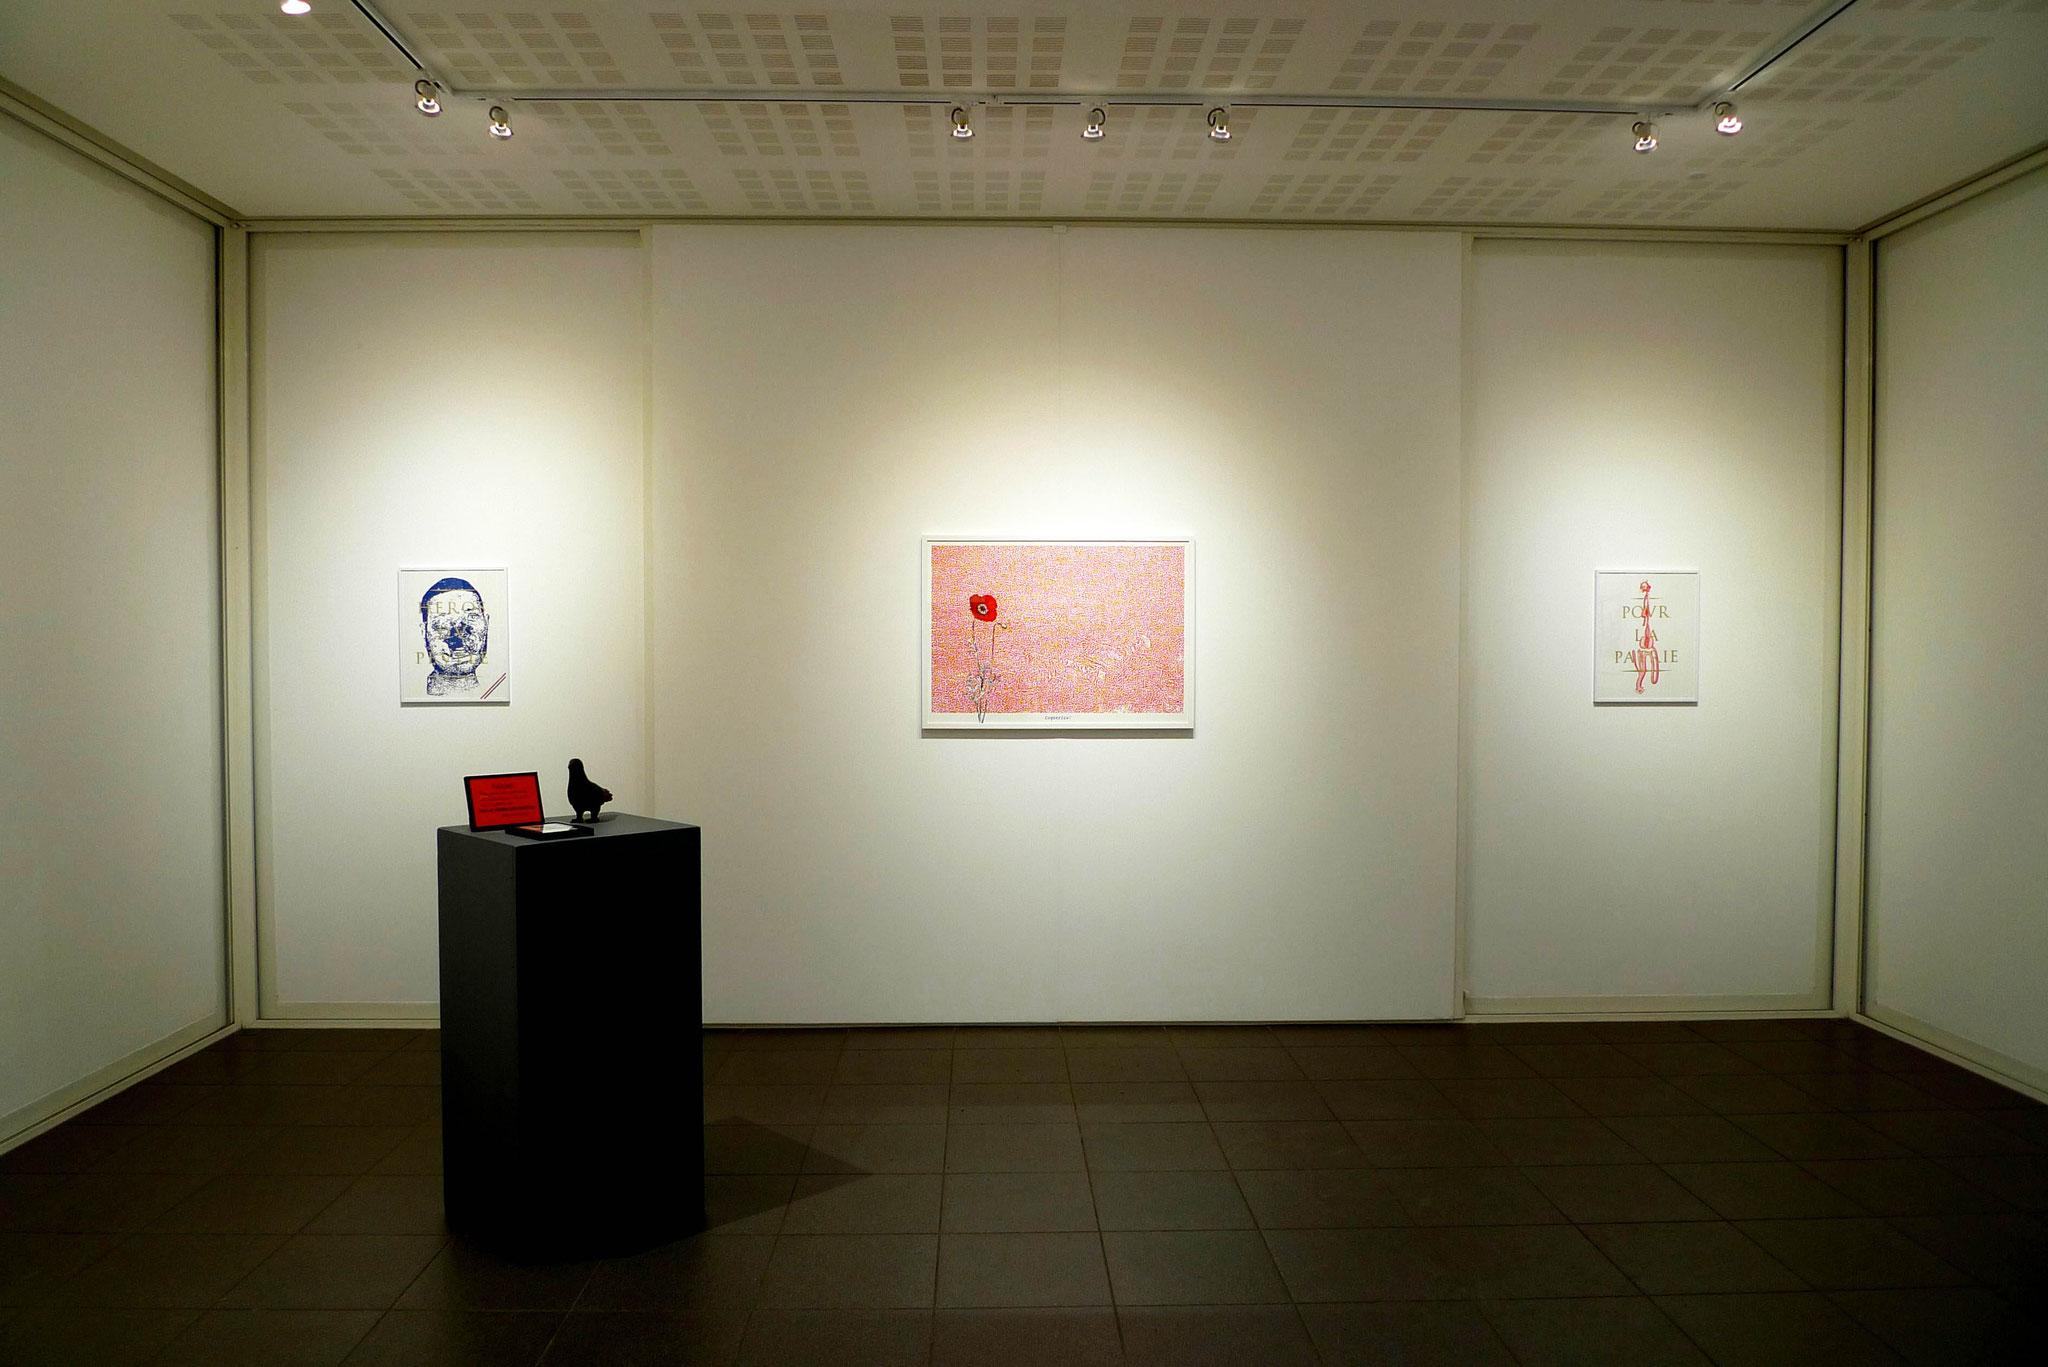 Vue de l'exposition Loïc Creff, Des Astres Artificiels. Photo : Loïc Creff